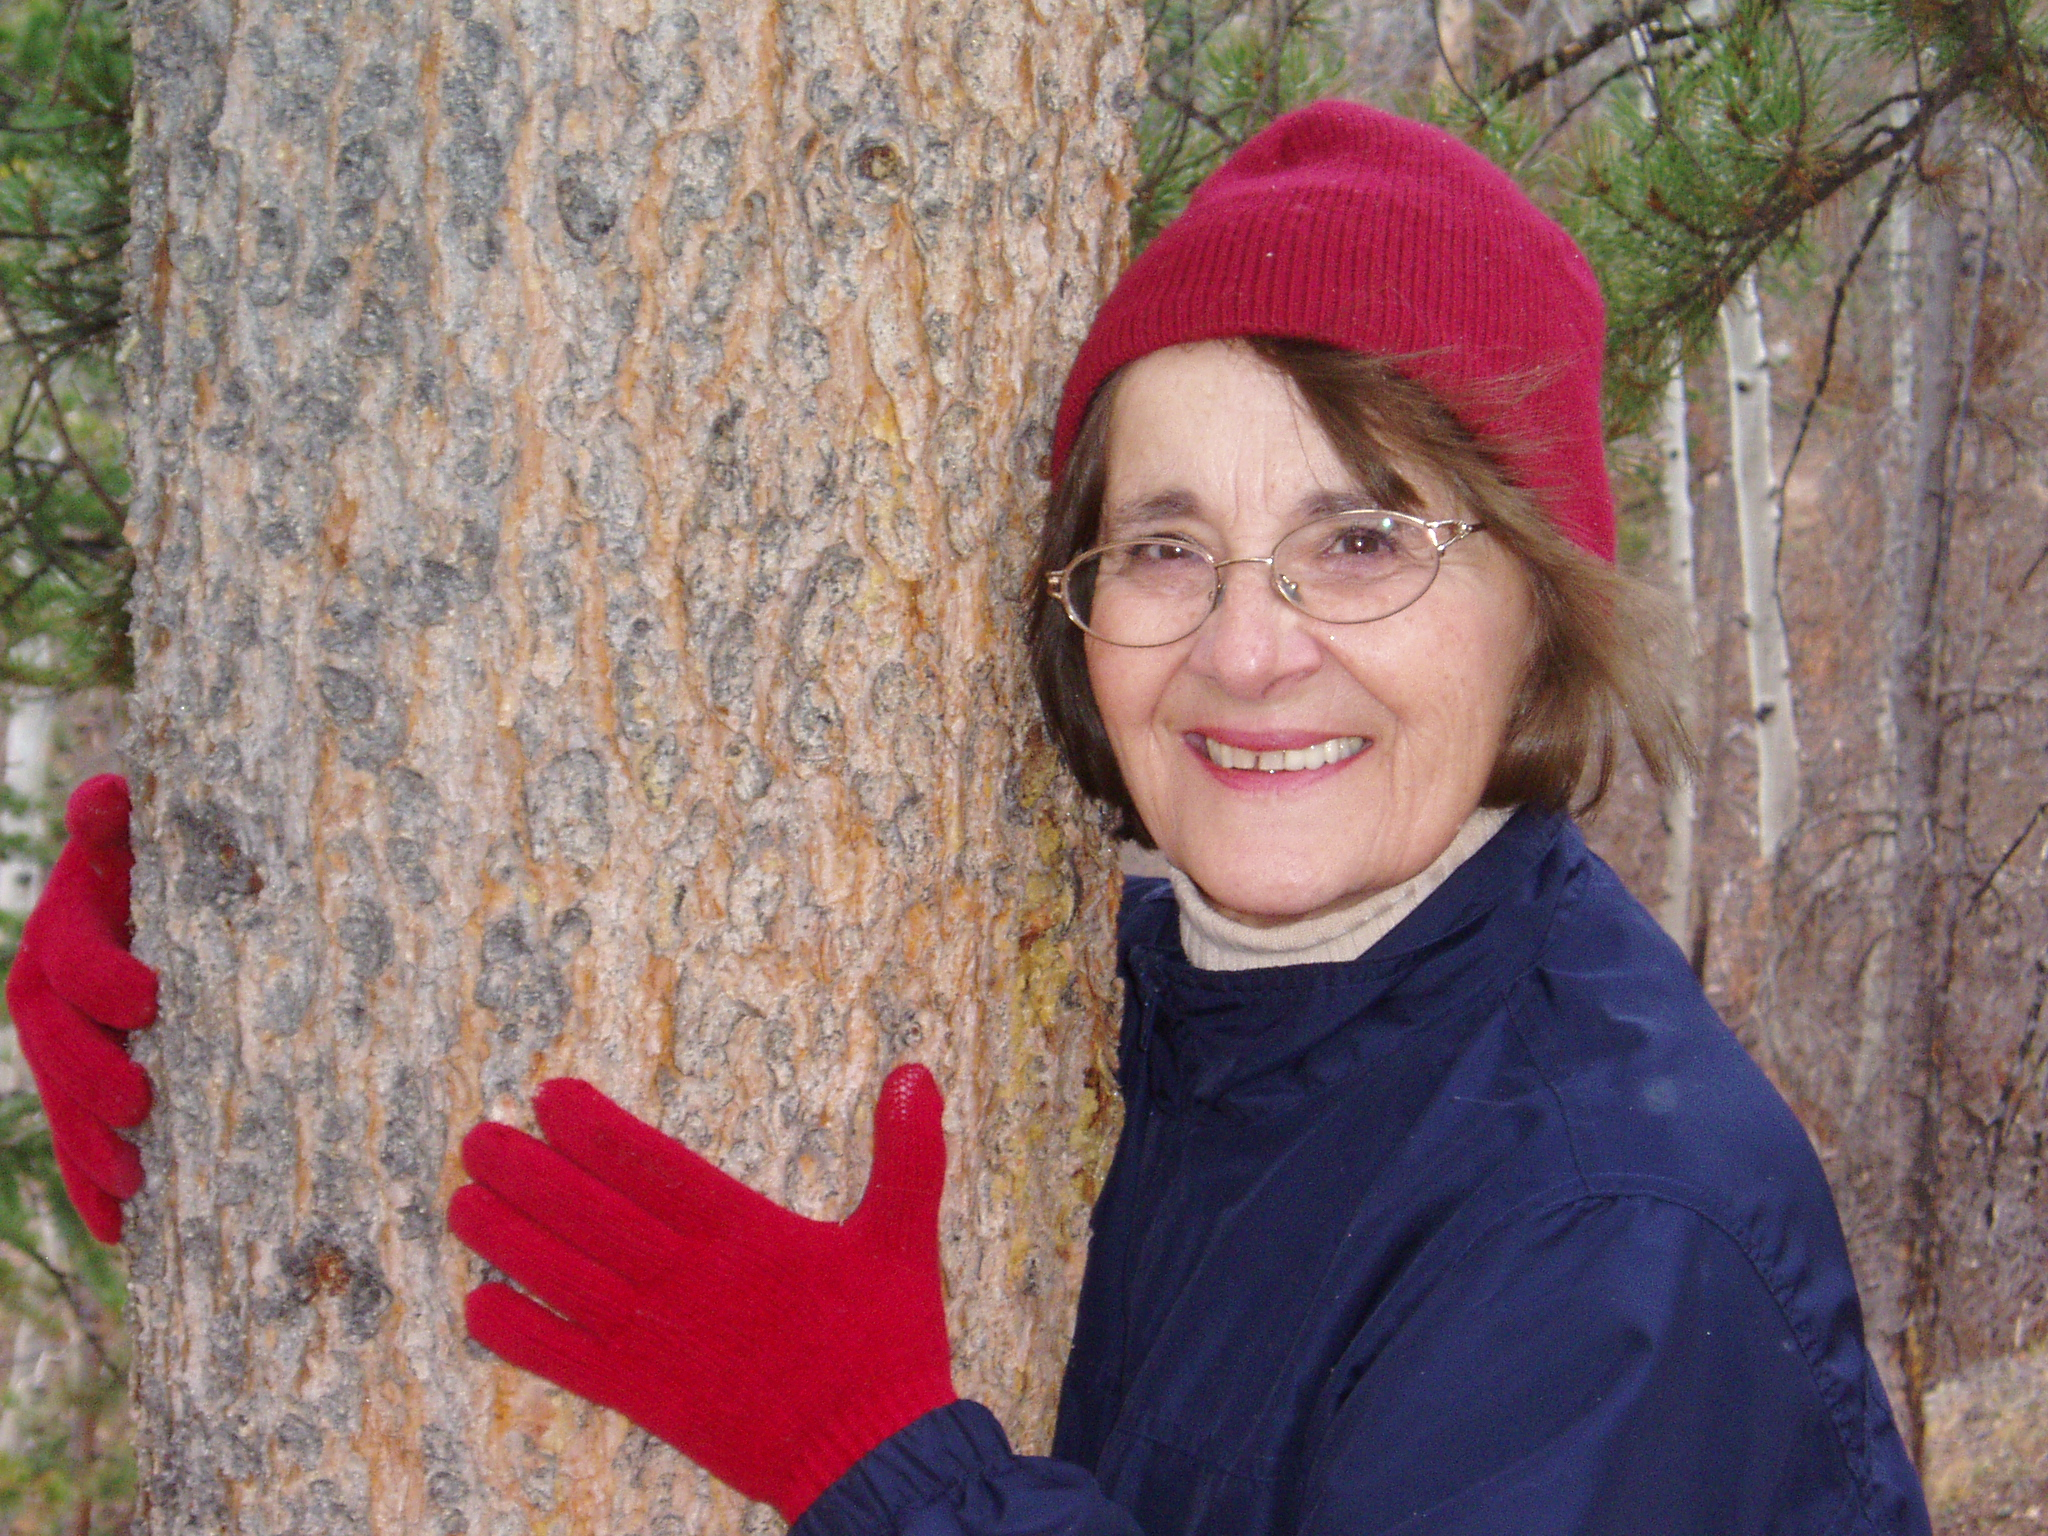 Carol Carpenter, a proud tree hugger